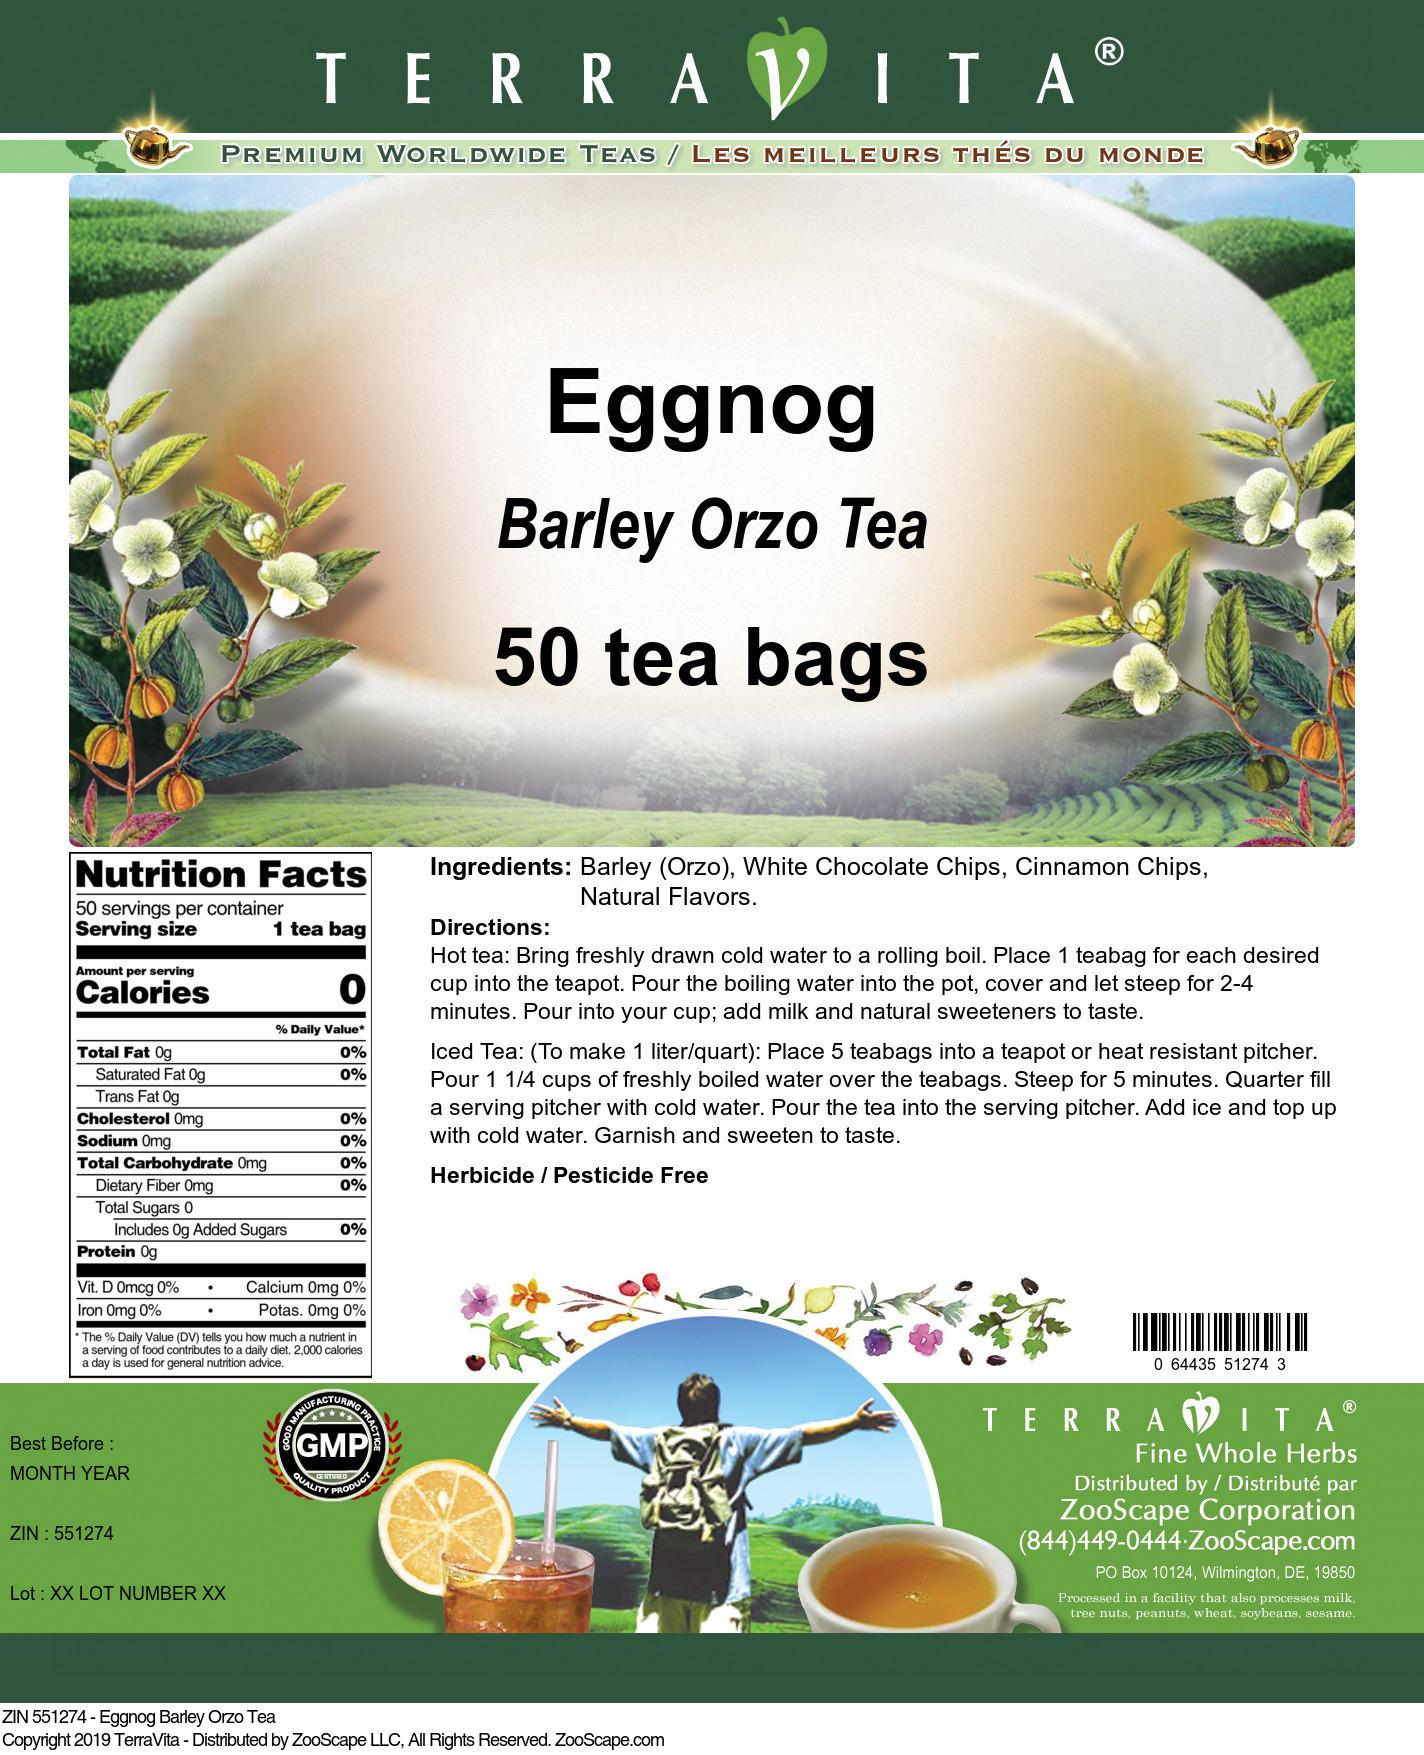 Eggnog Barley Orzo Tea